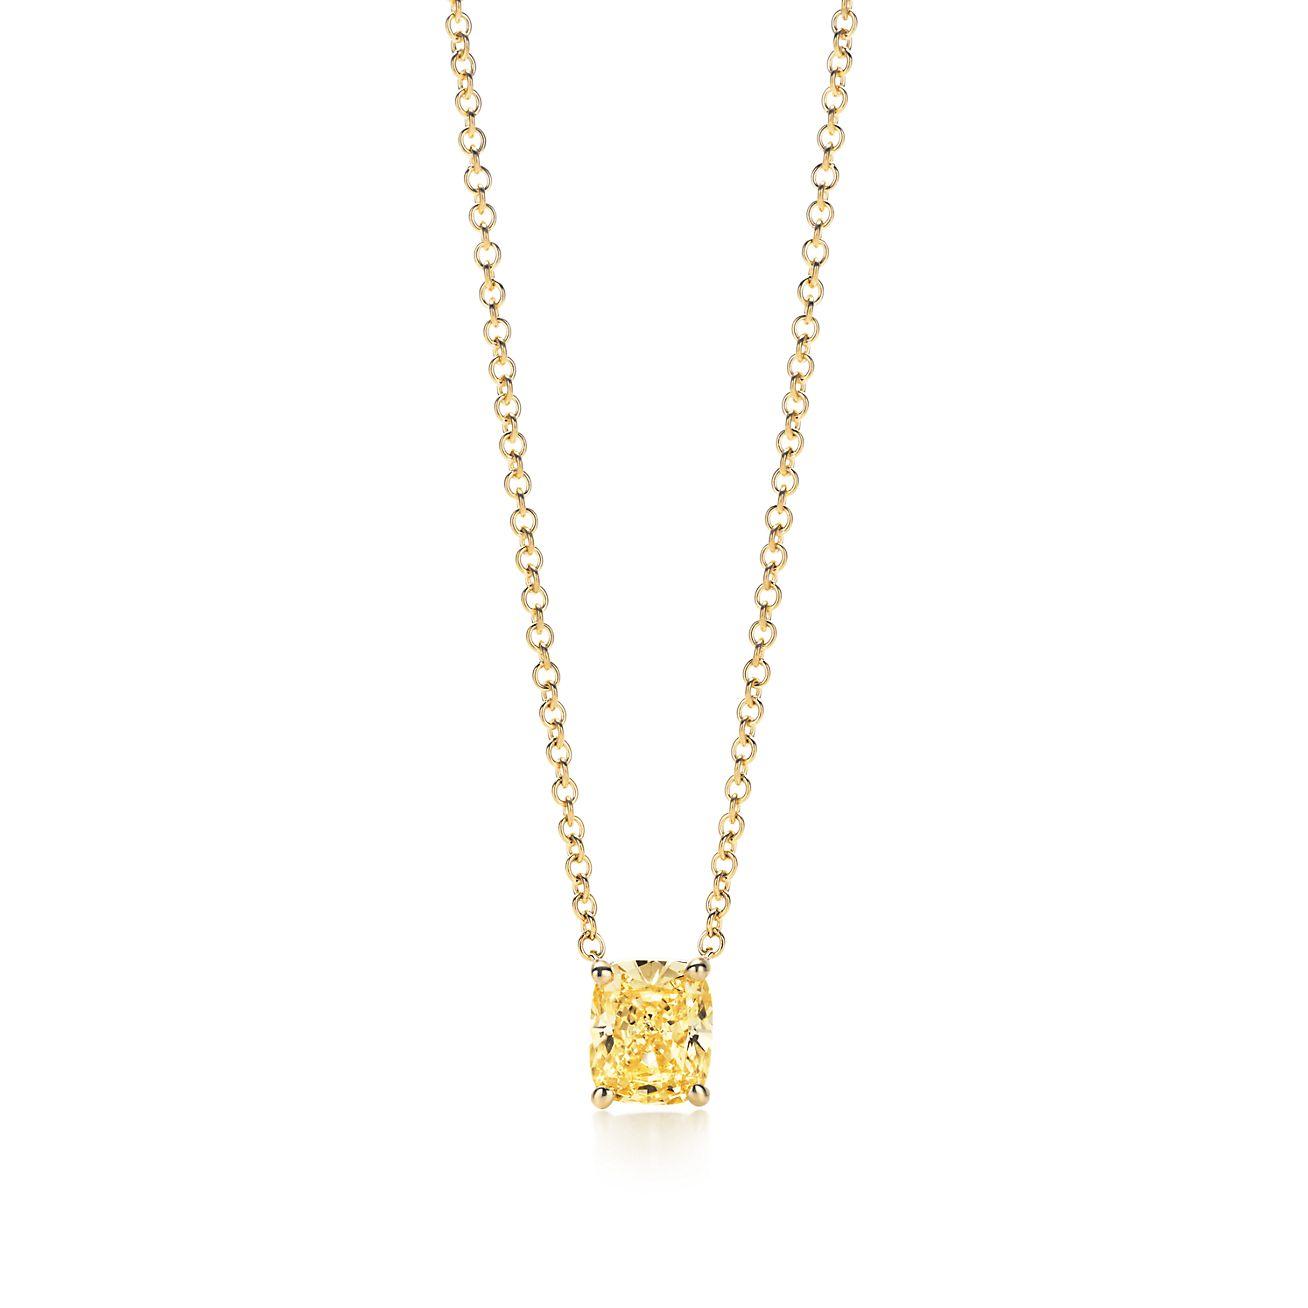 Tiffany cushion cut yellow diamond pendant tiffany co cushion cut yellow diamond pendant aloadofball Image collections